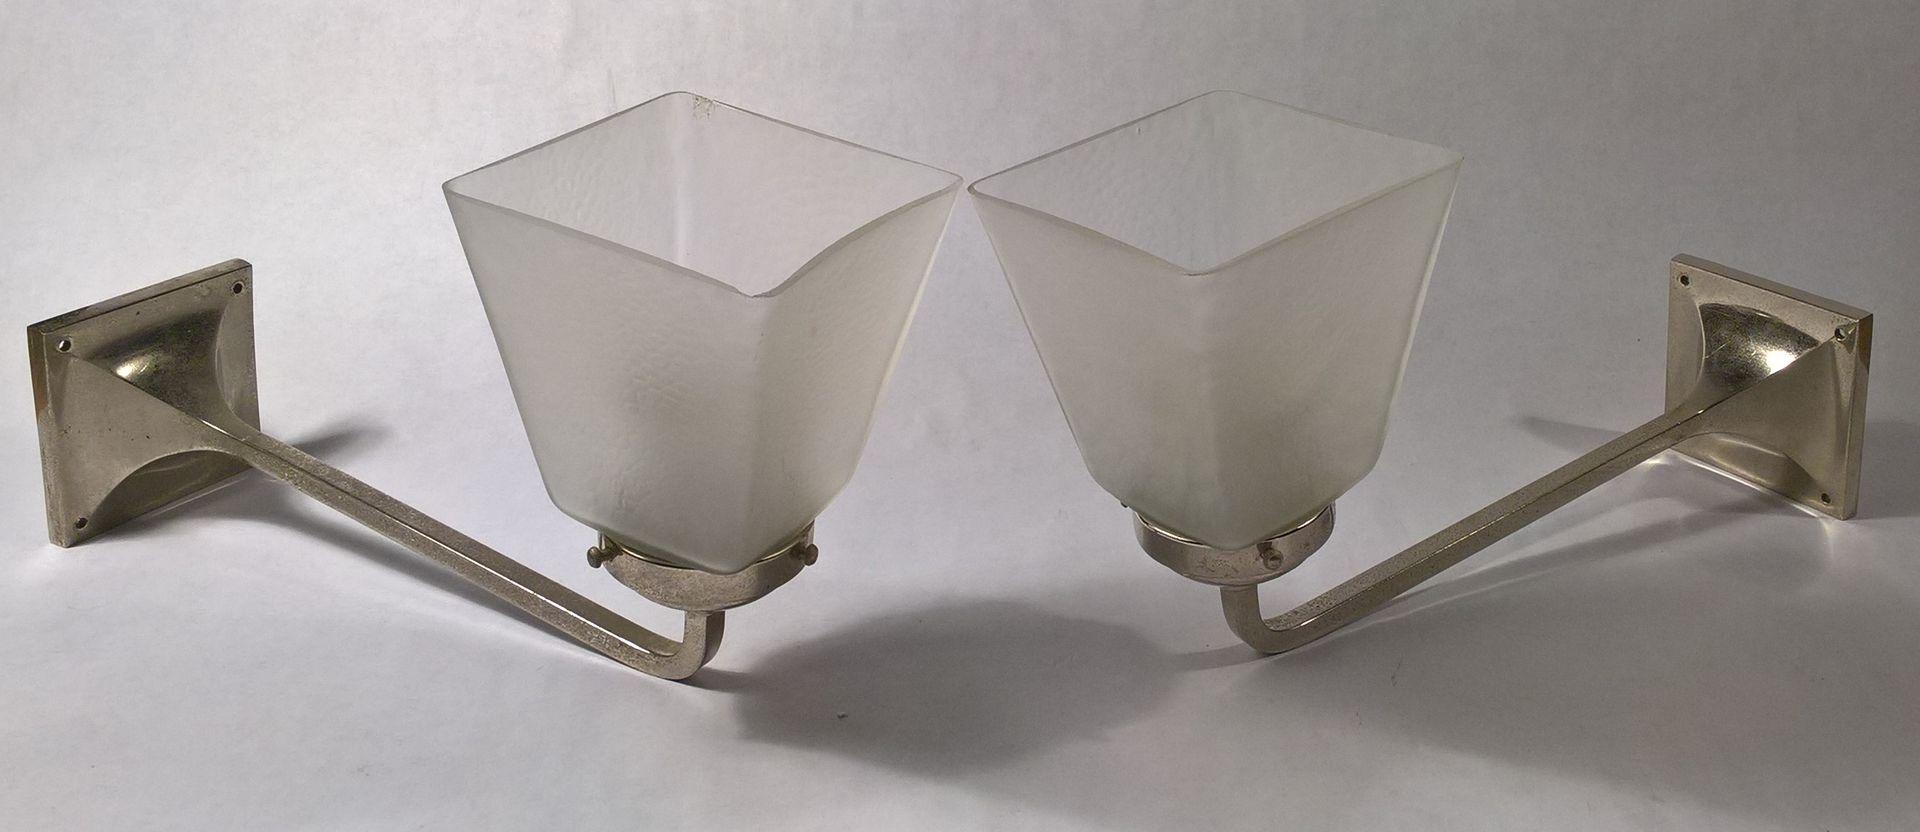 vernickelte moderne wandleuchten 1920er 2er set bei pamono kaufen. Black Bedroom Furniture Sets. Home Design Ideas